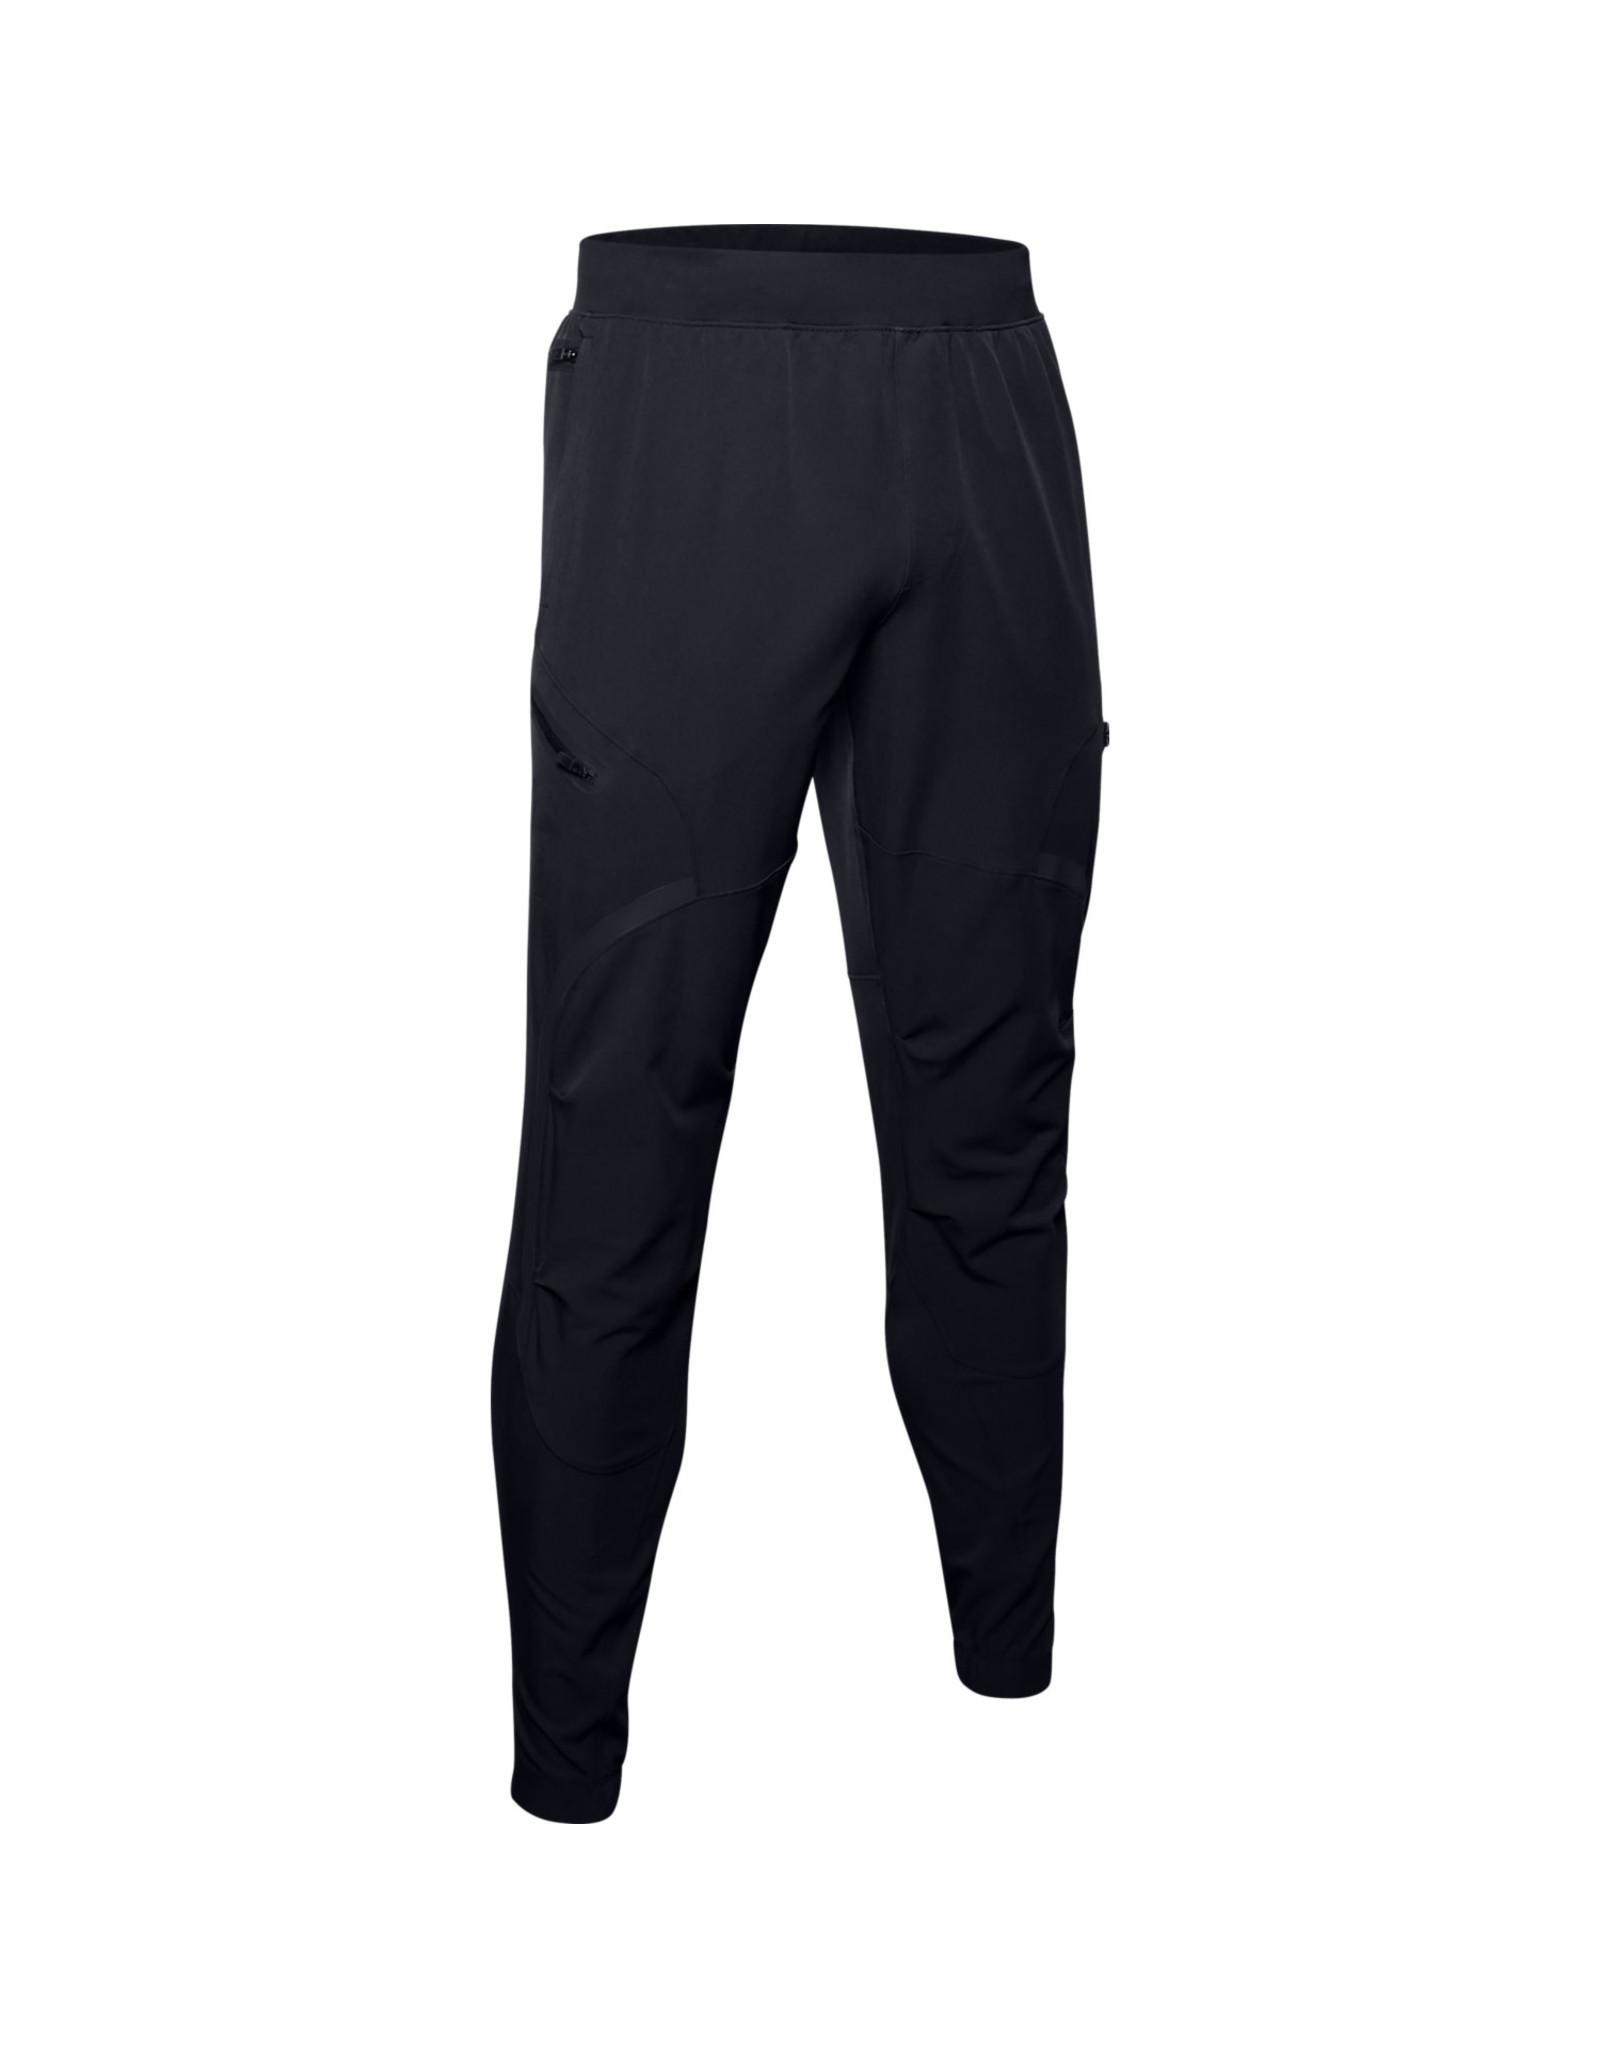 Under Armour UA Unstoppable Cargo Pants - Black